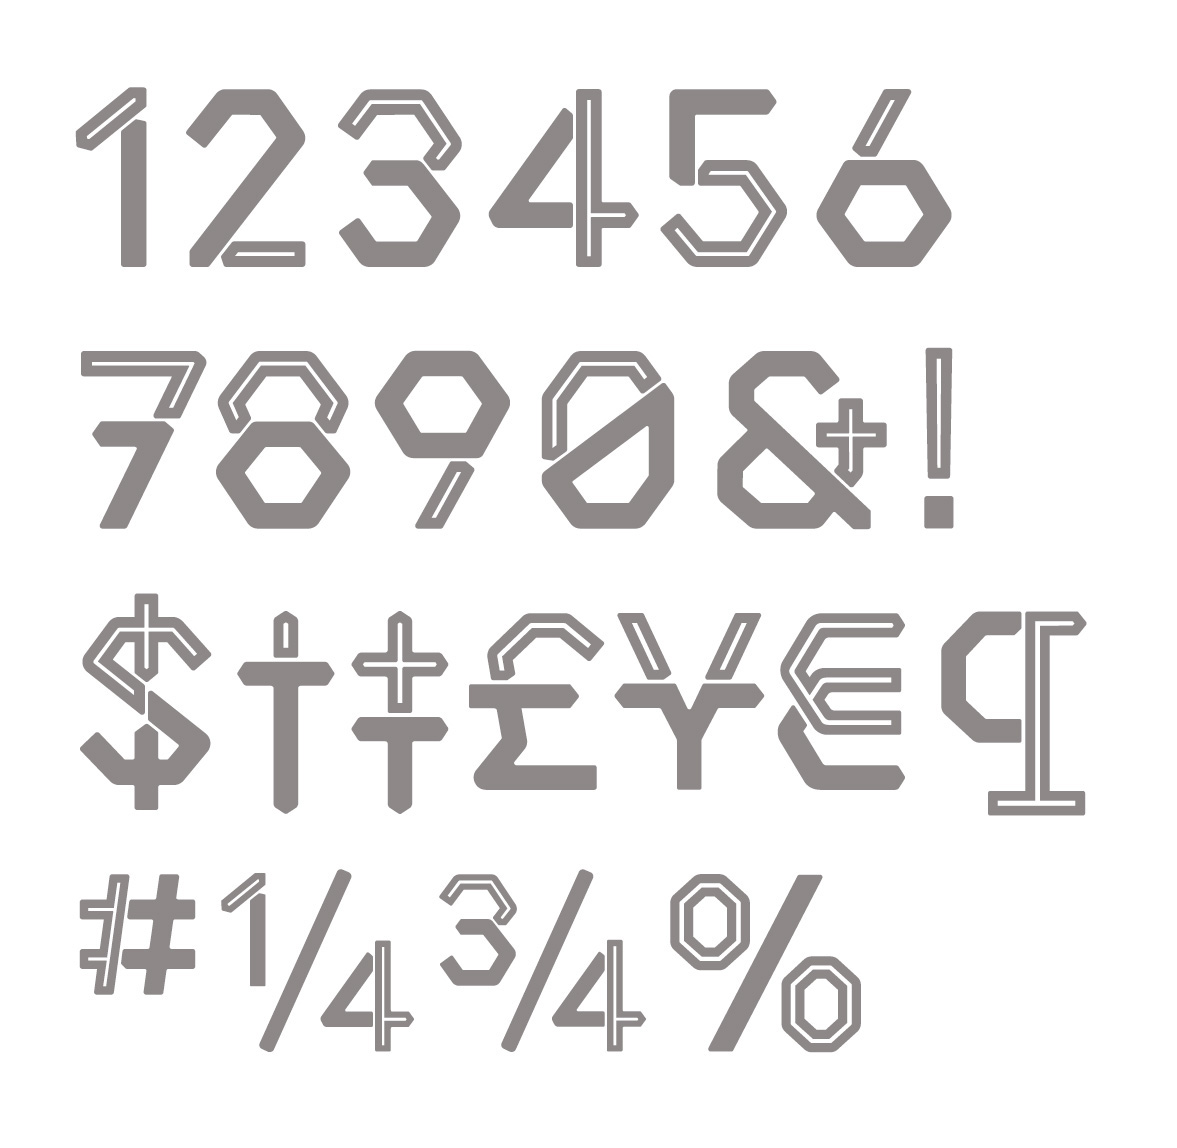 Middlecase Next Free Font - decorative-display